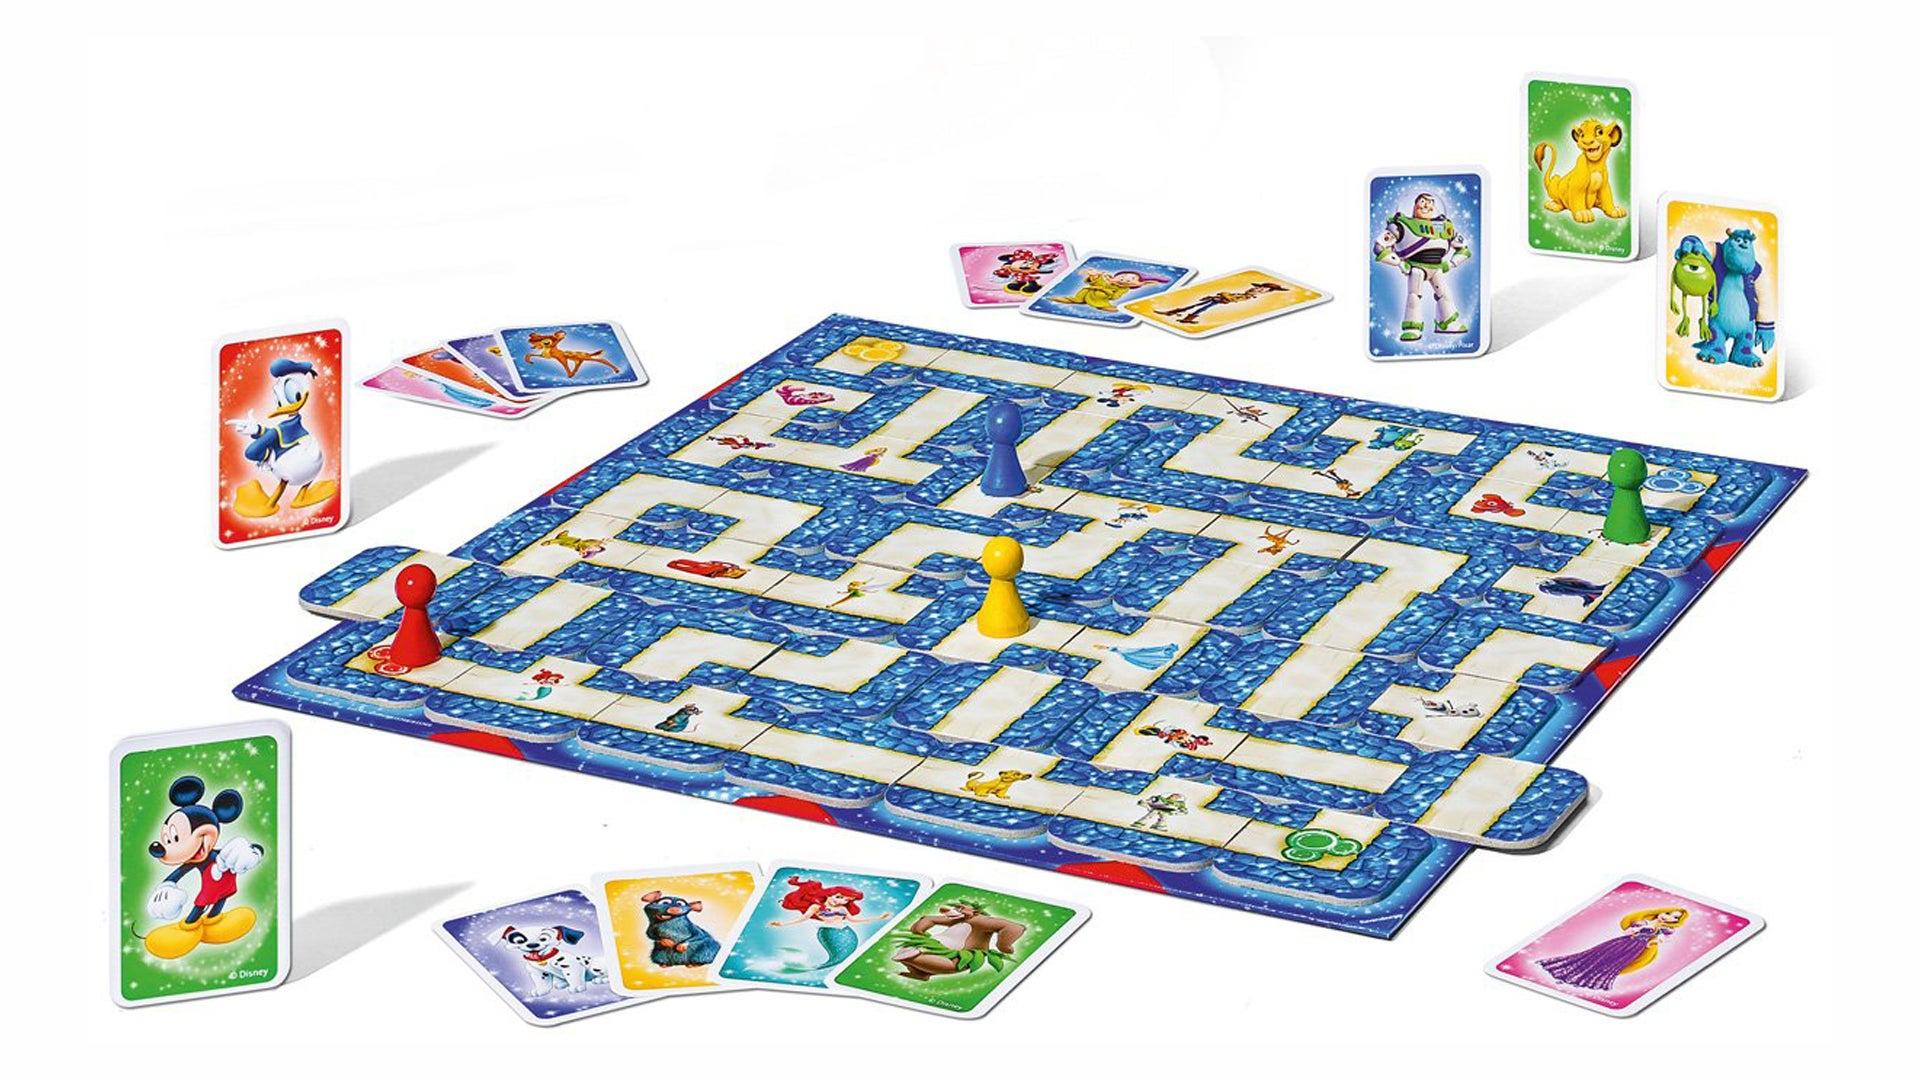 Disney Pixar Labyrinth board game layout